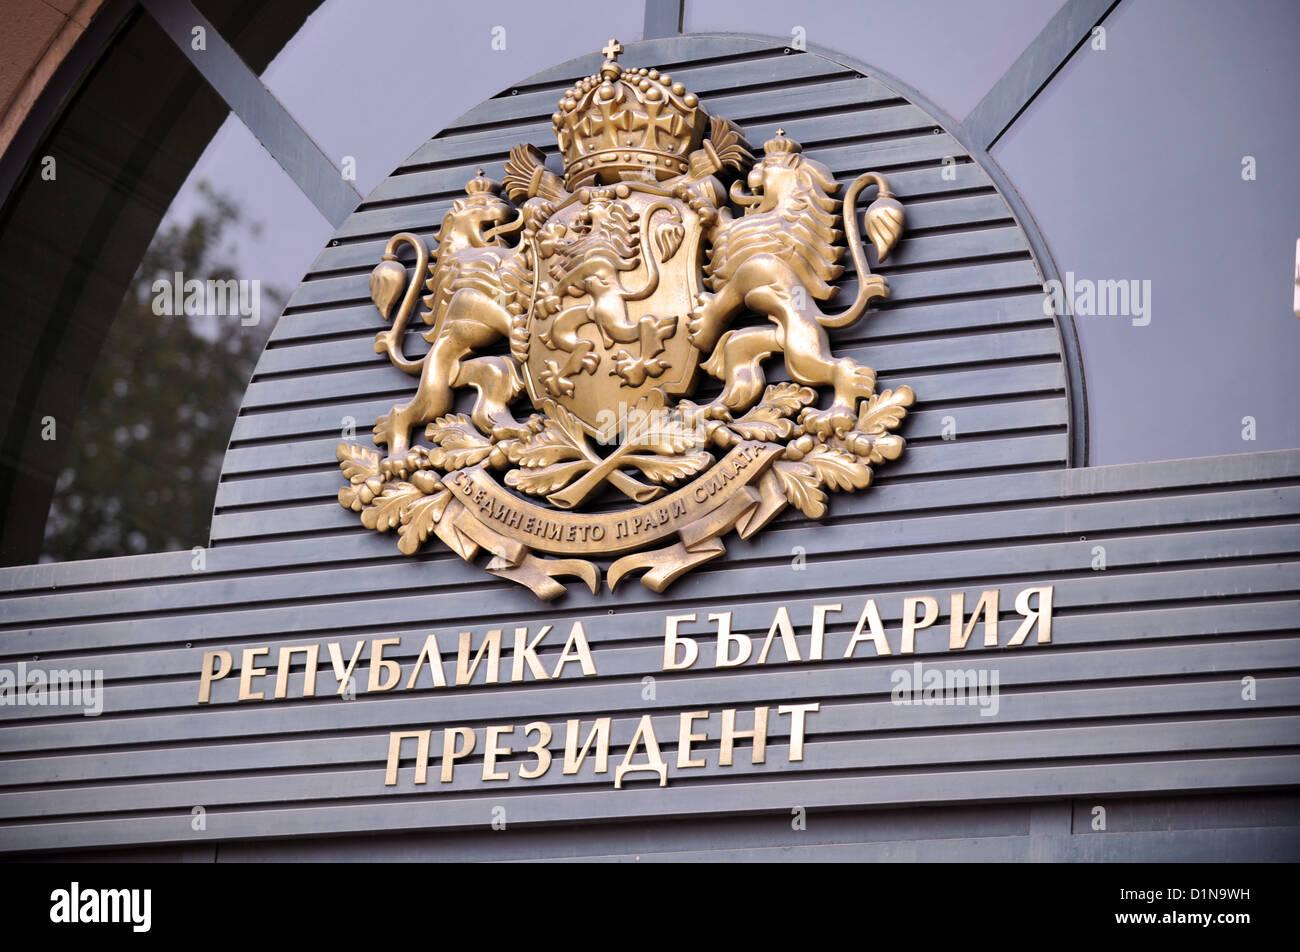 President's Office sign, Sofia, Bulgaria - Stock Image